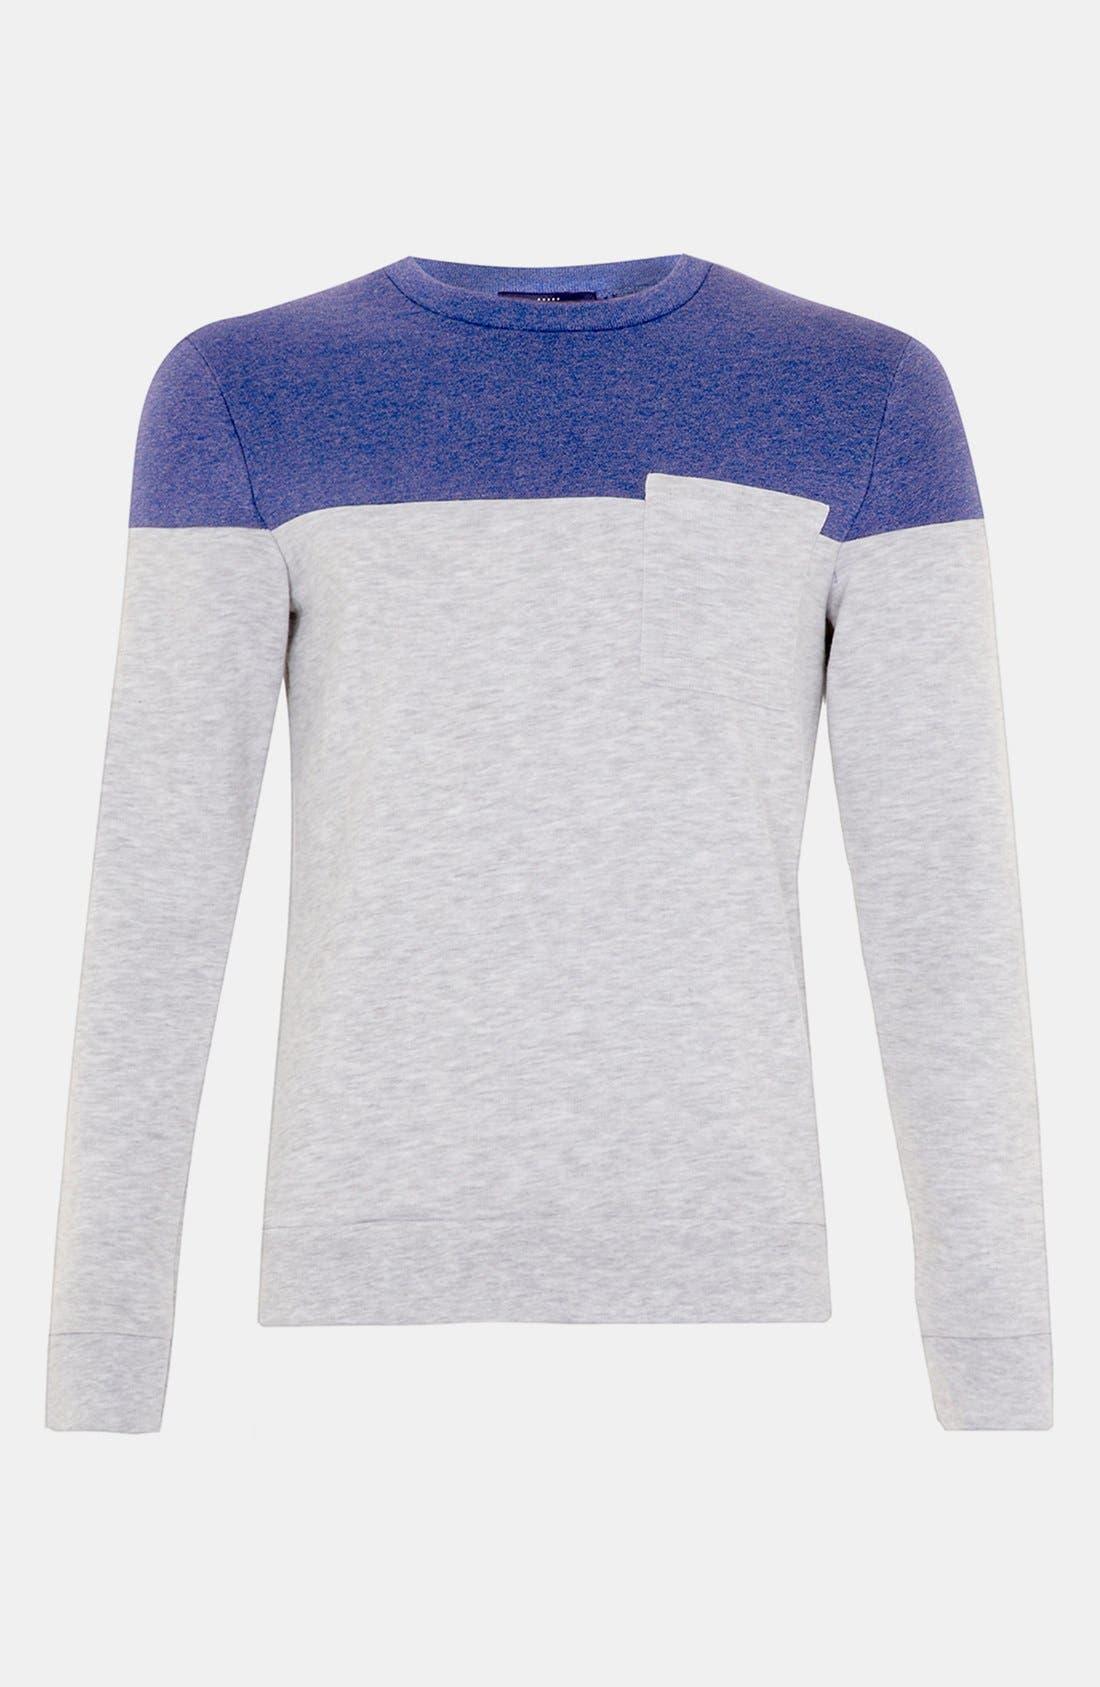 Main Image - Topman Cut & Sew Crewneck Sweatshirt